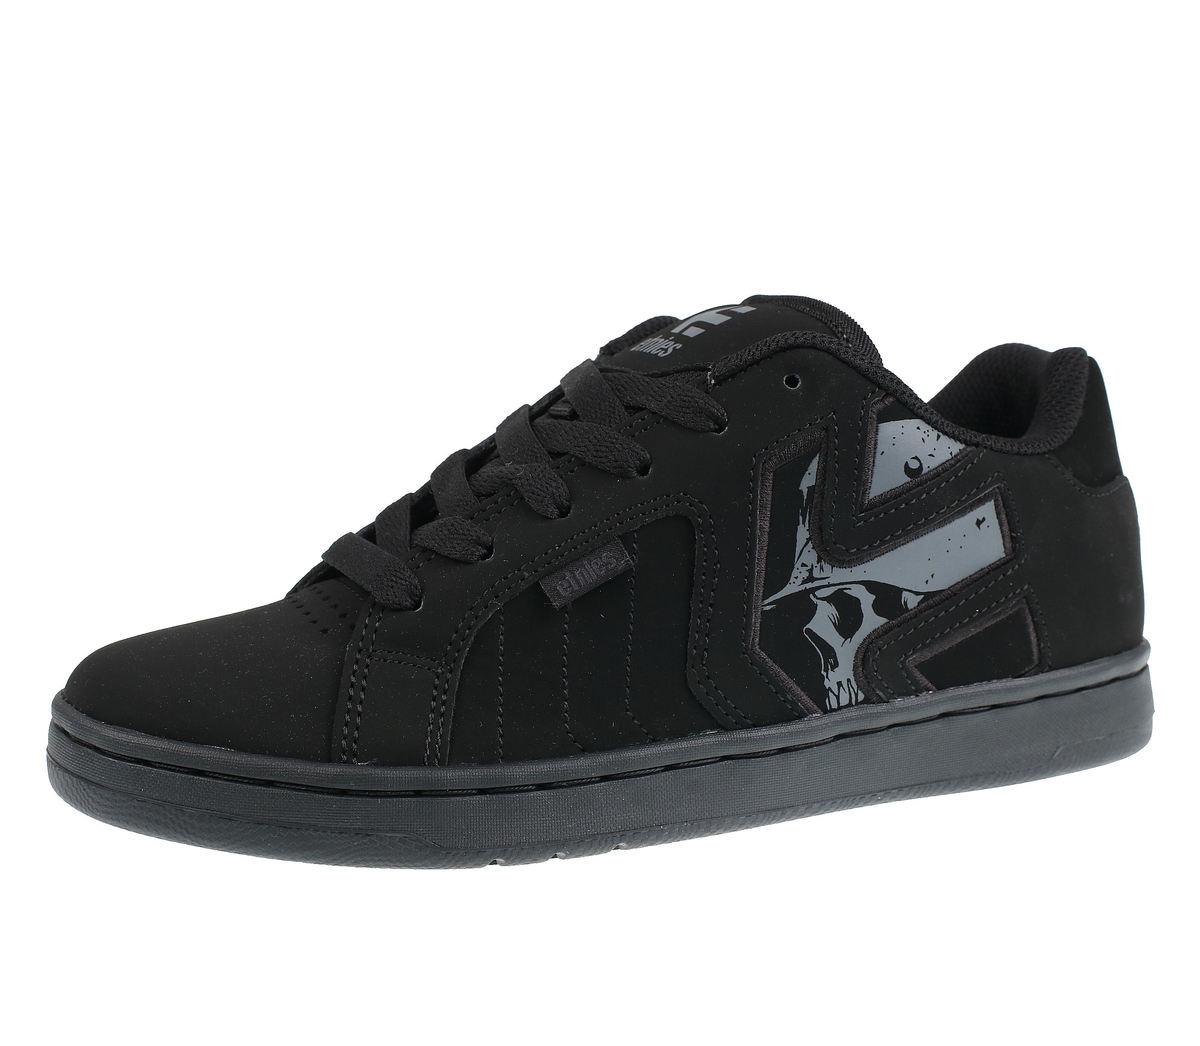 topánky ETNIES - Metal Mulisha - Fader 2 - BLACK / BLACK / BLACK - 10055221